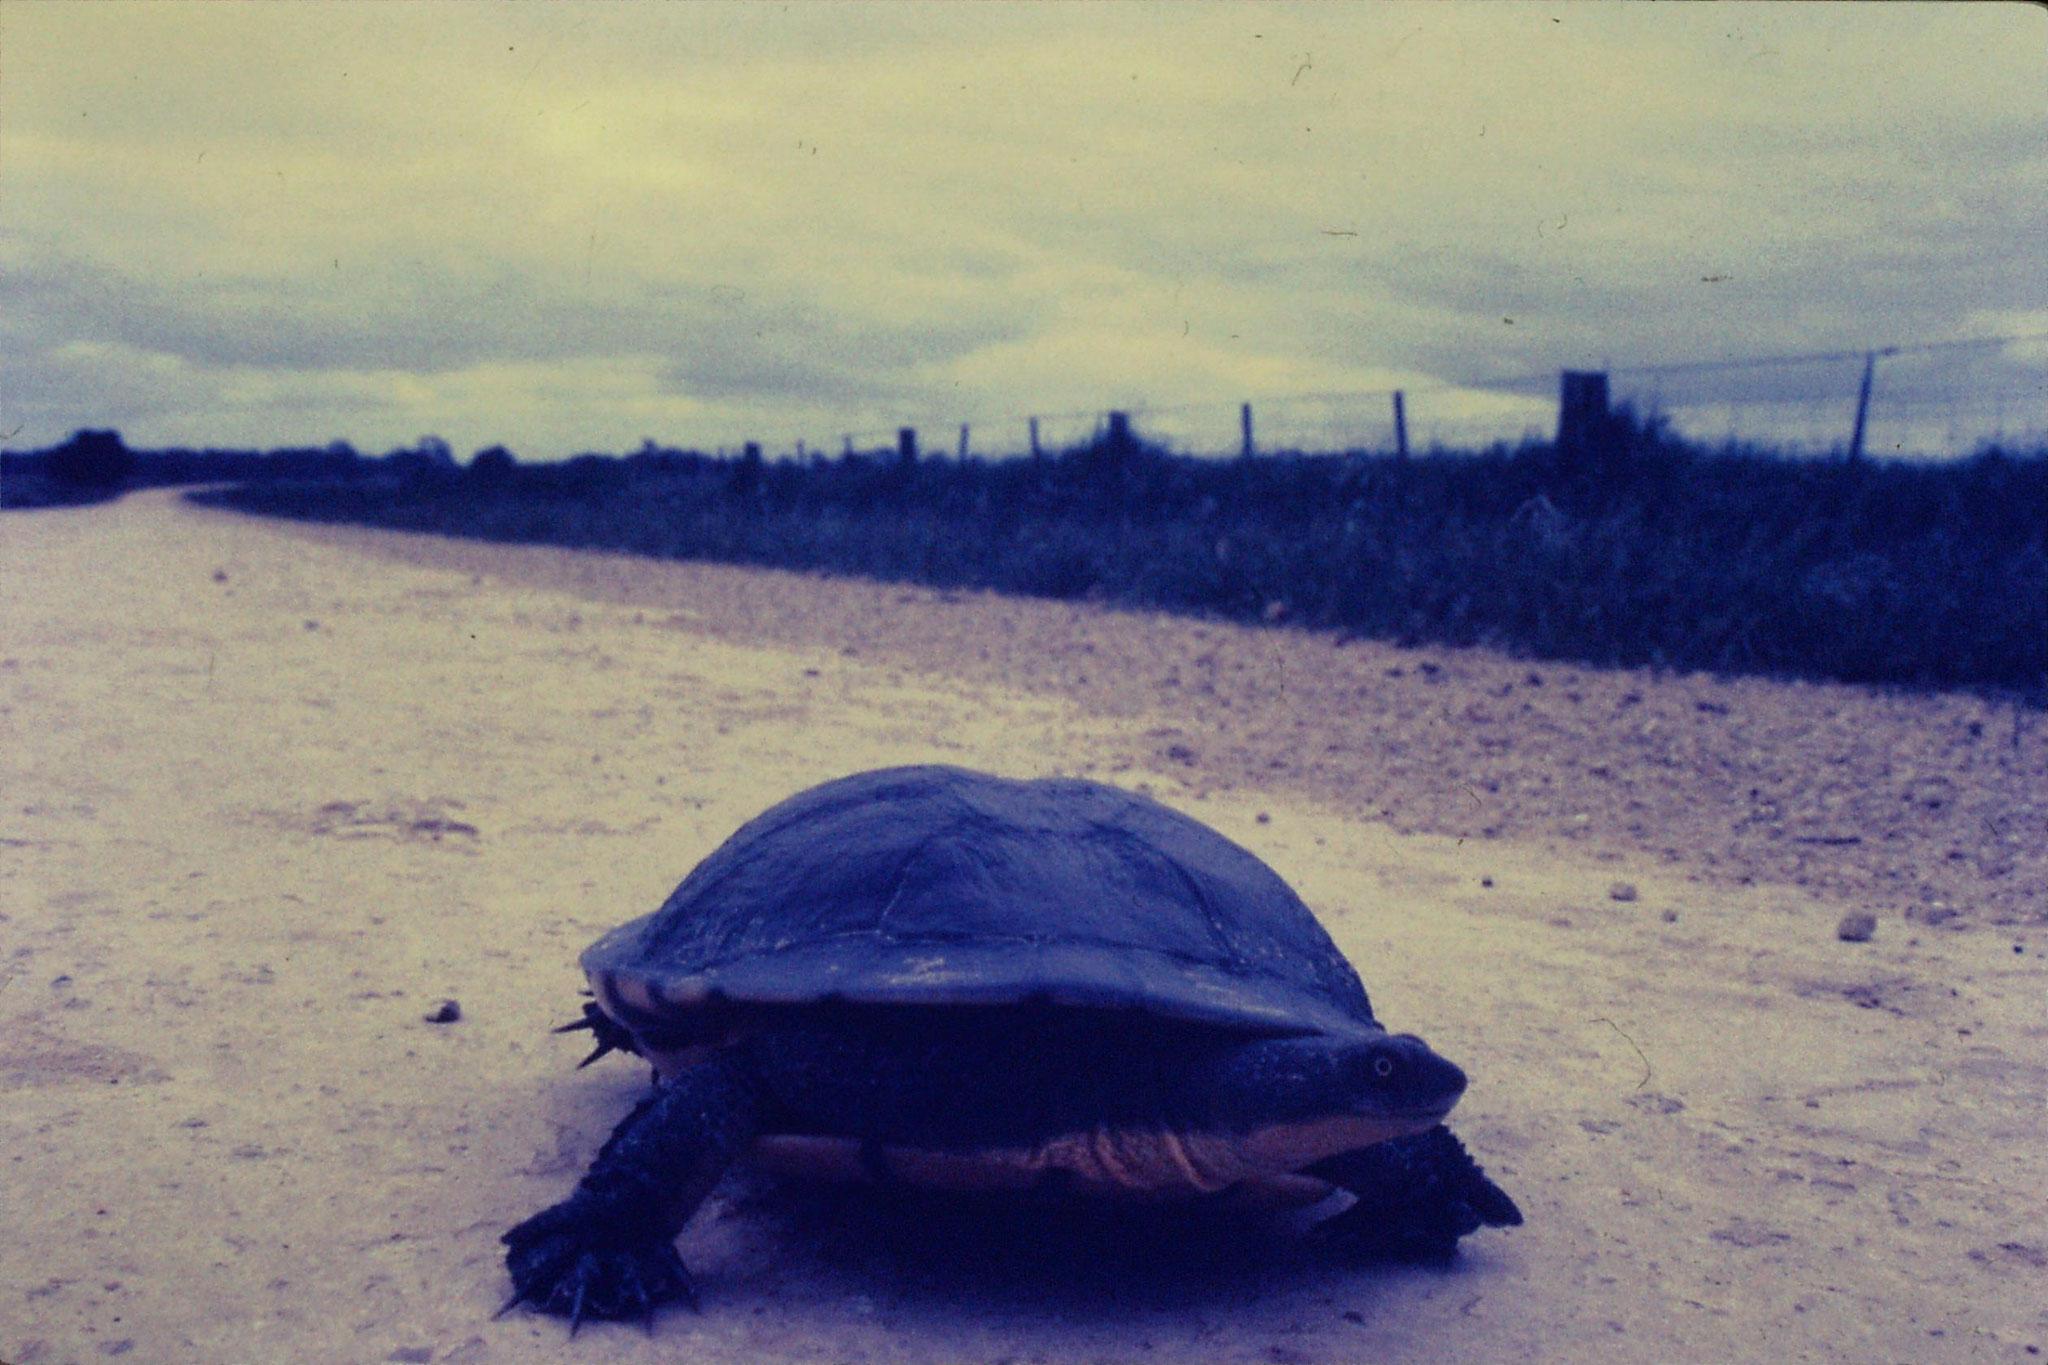 7/11/1990: 6: Naracoorte, tortoise 9 inch